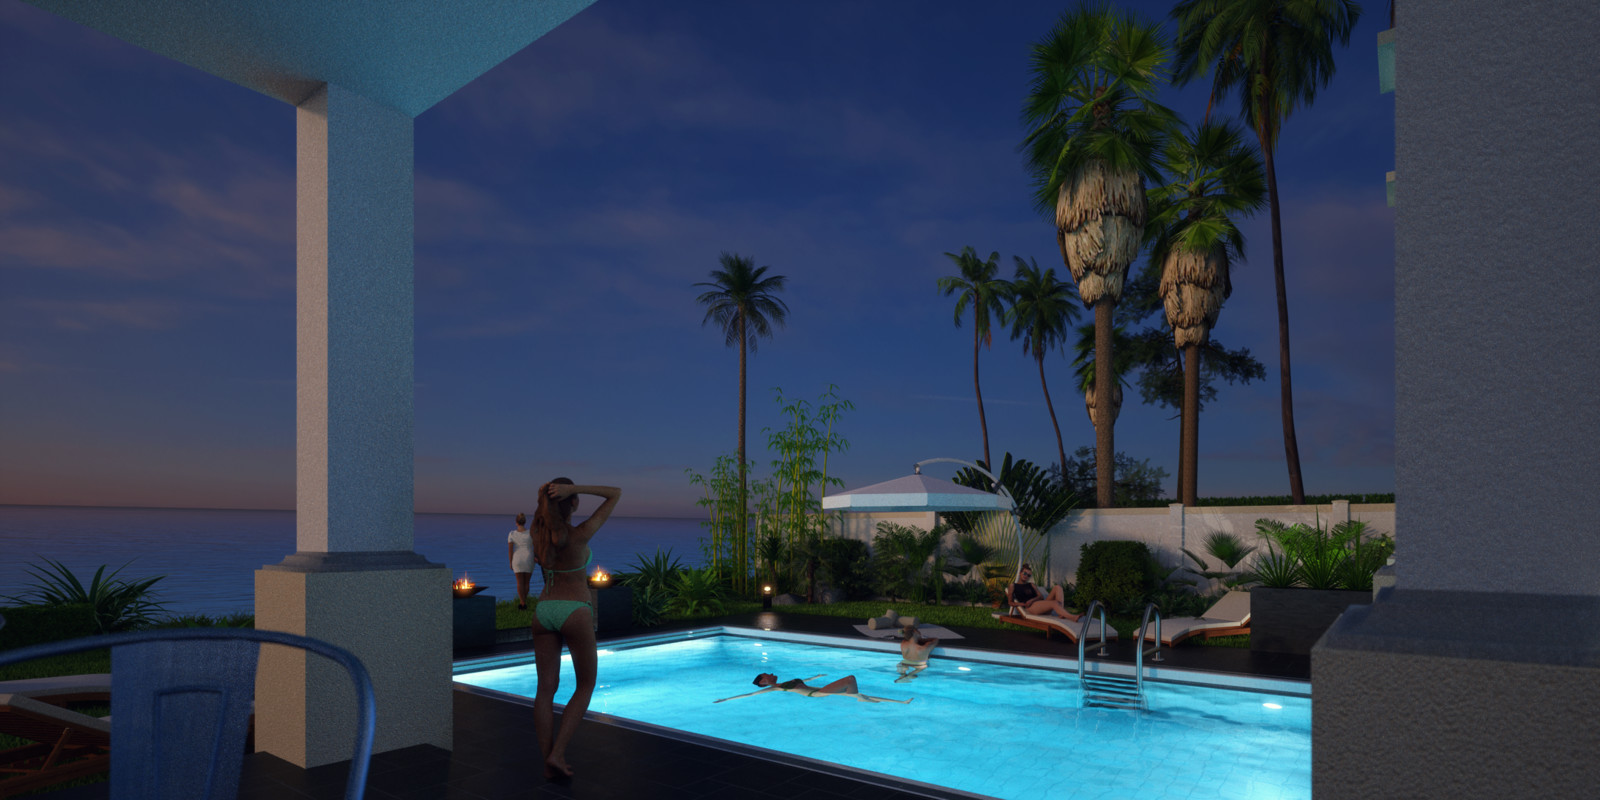 SketchUp + Thea Render  Seagrove Beach House: Poolside 6B Night B Glare Doris 2160 × 1080 Presto MC Bucket